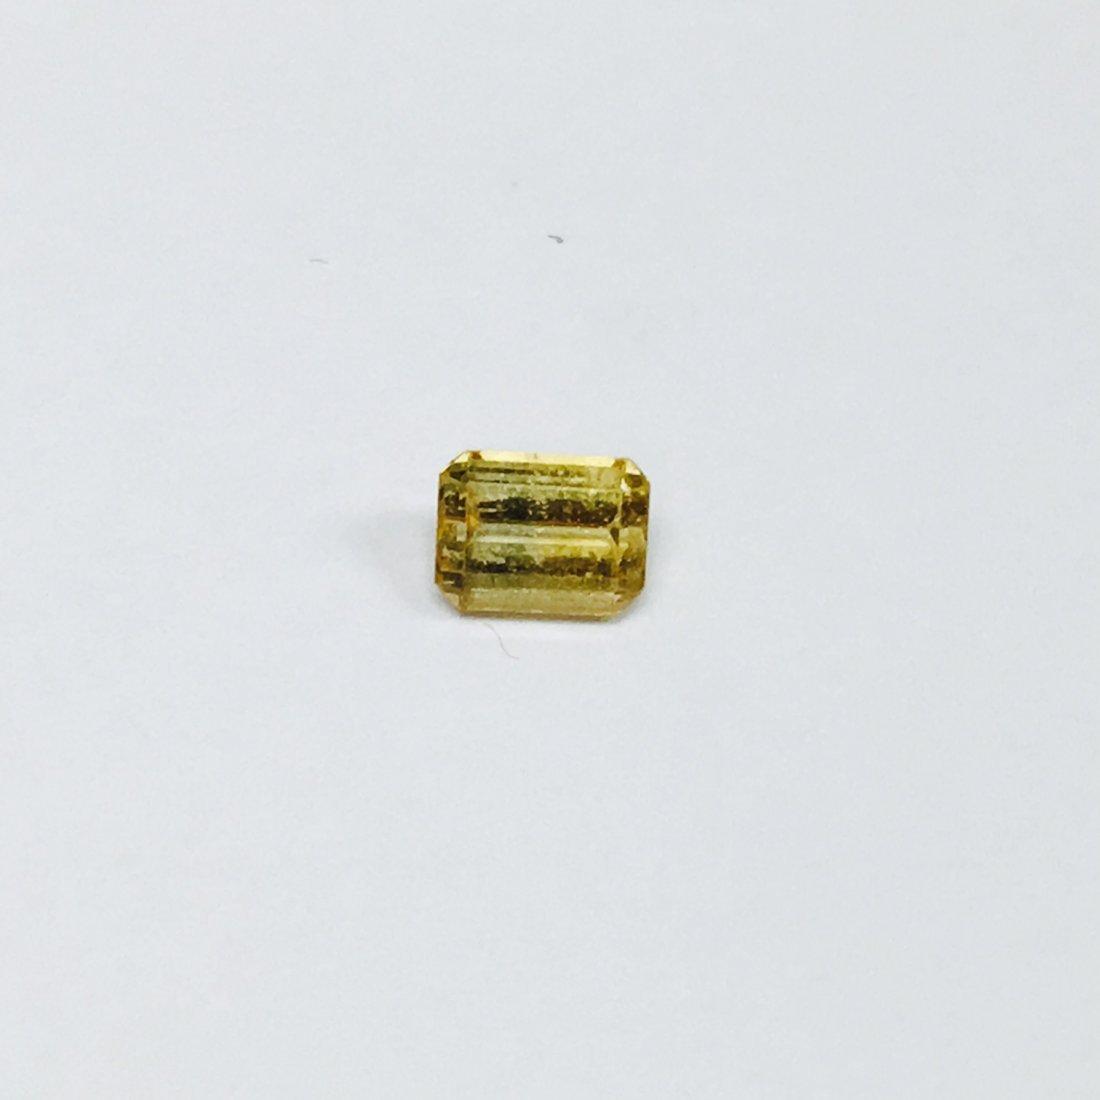 0.70 Carat Yellow Sapphire, 100% Natural Good Quality